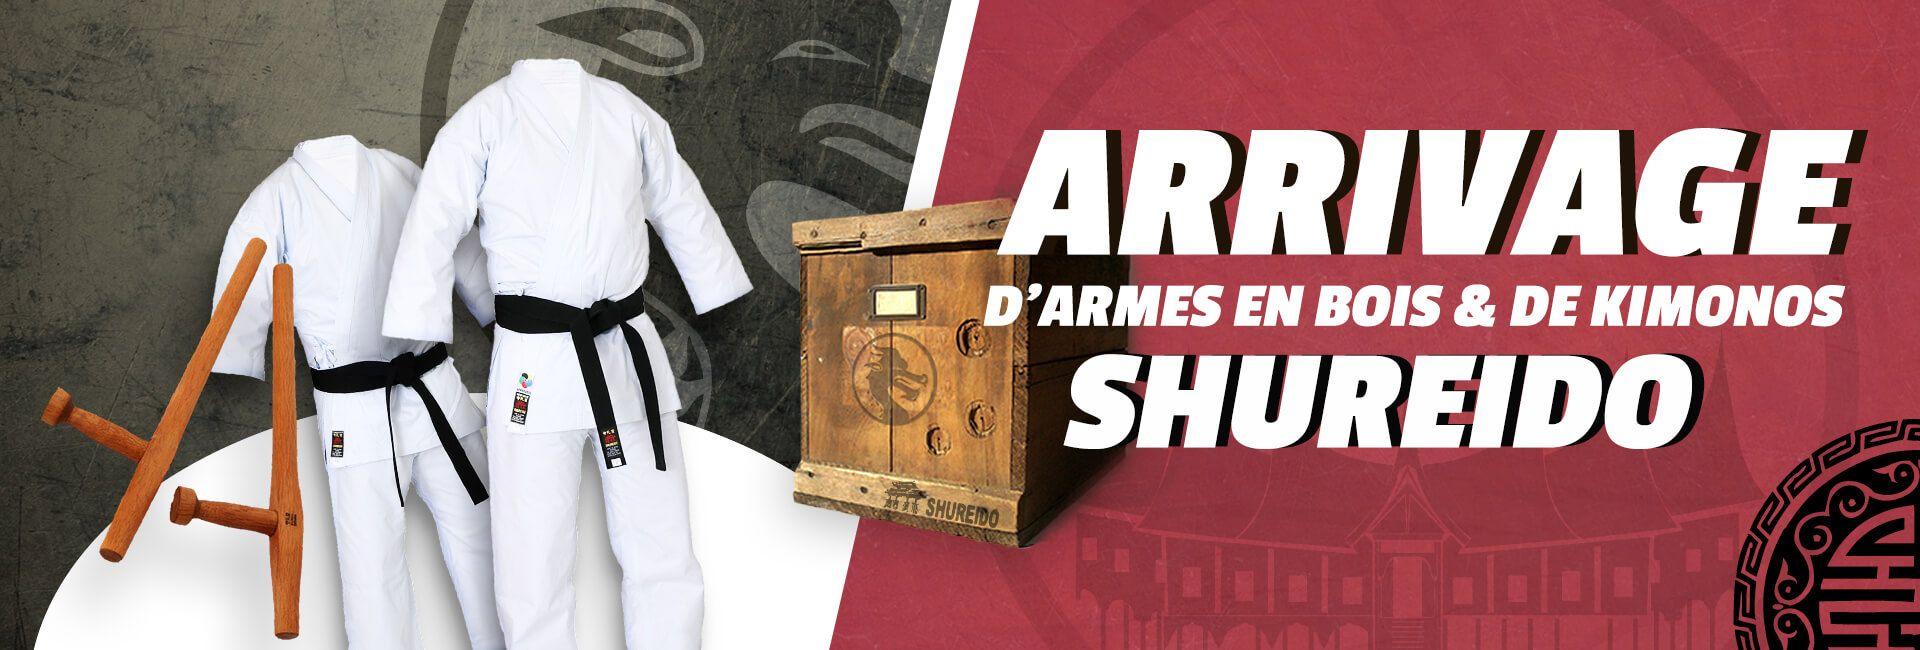 Arrivage de kimonos & armes en bois Shureido